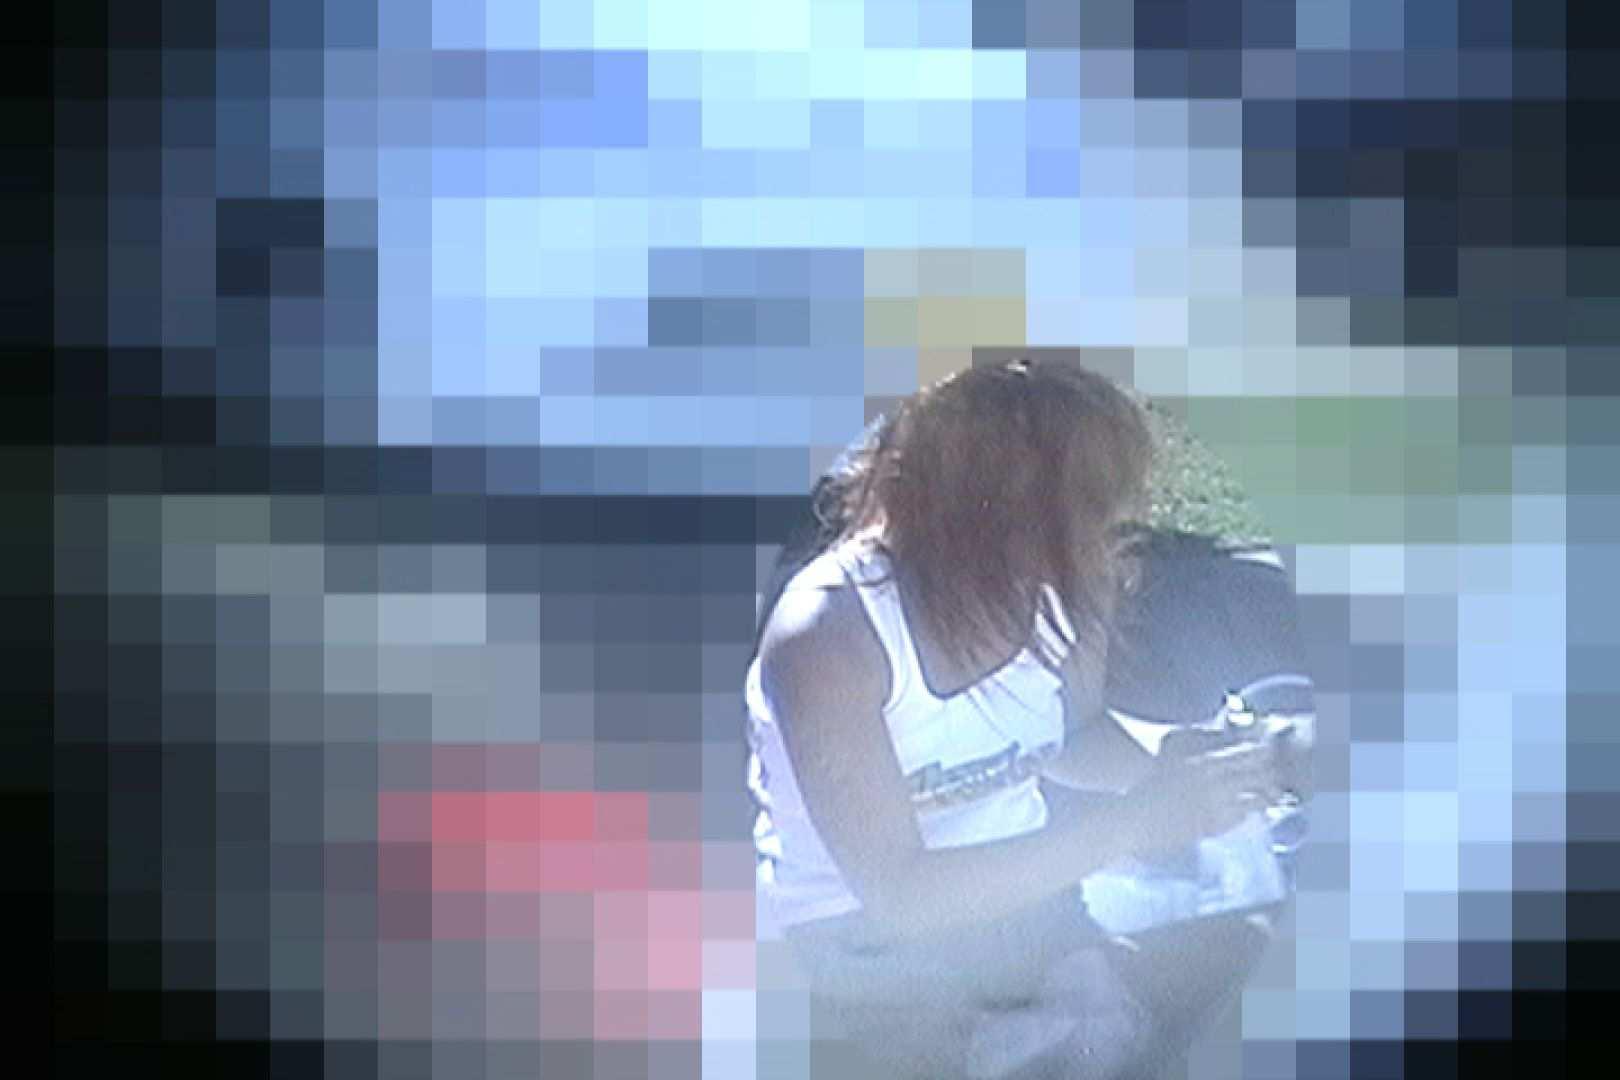 No.53 金髪ギャルの乳首に向かってズームイン 美乳 ワレメ無修正動画無料 109枚 26